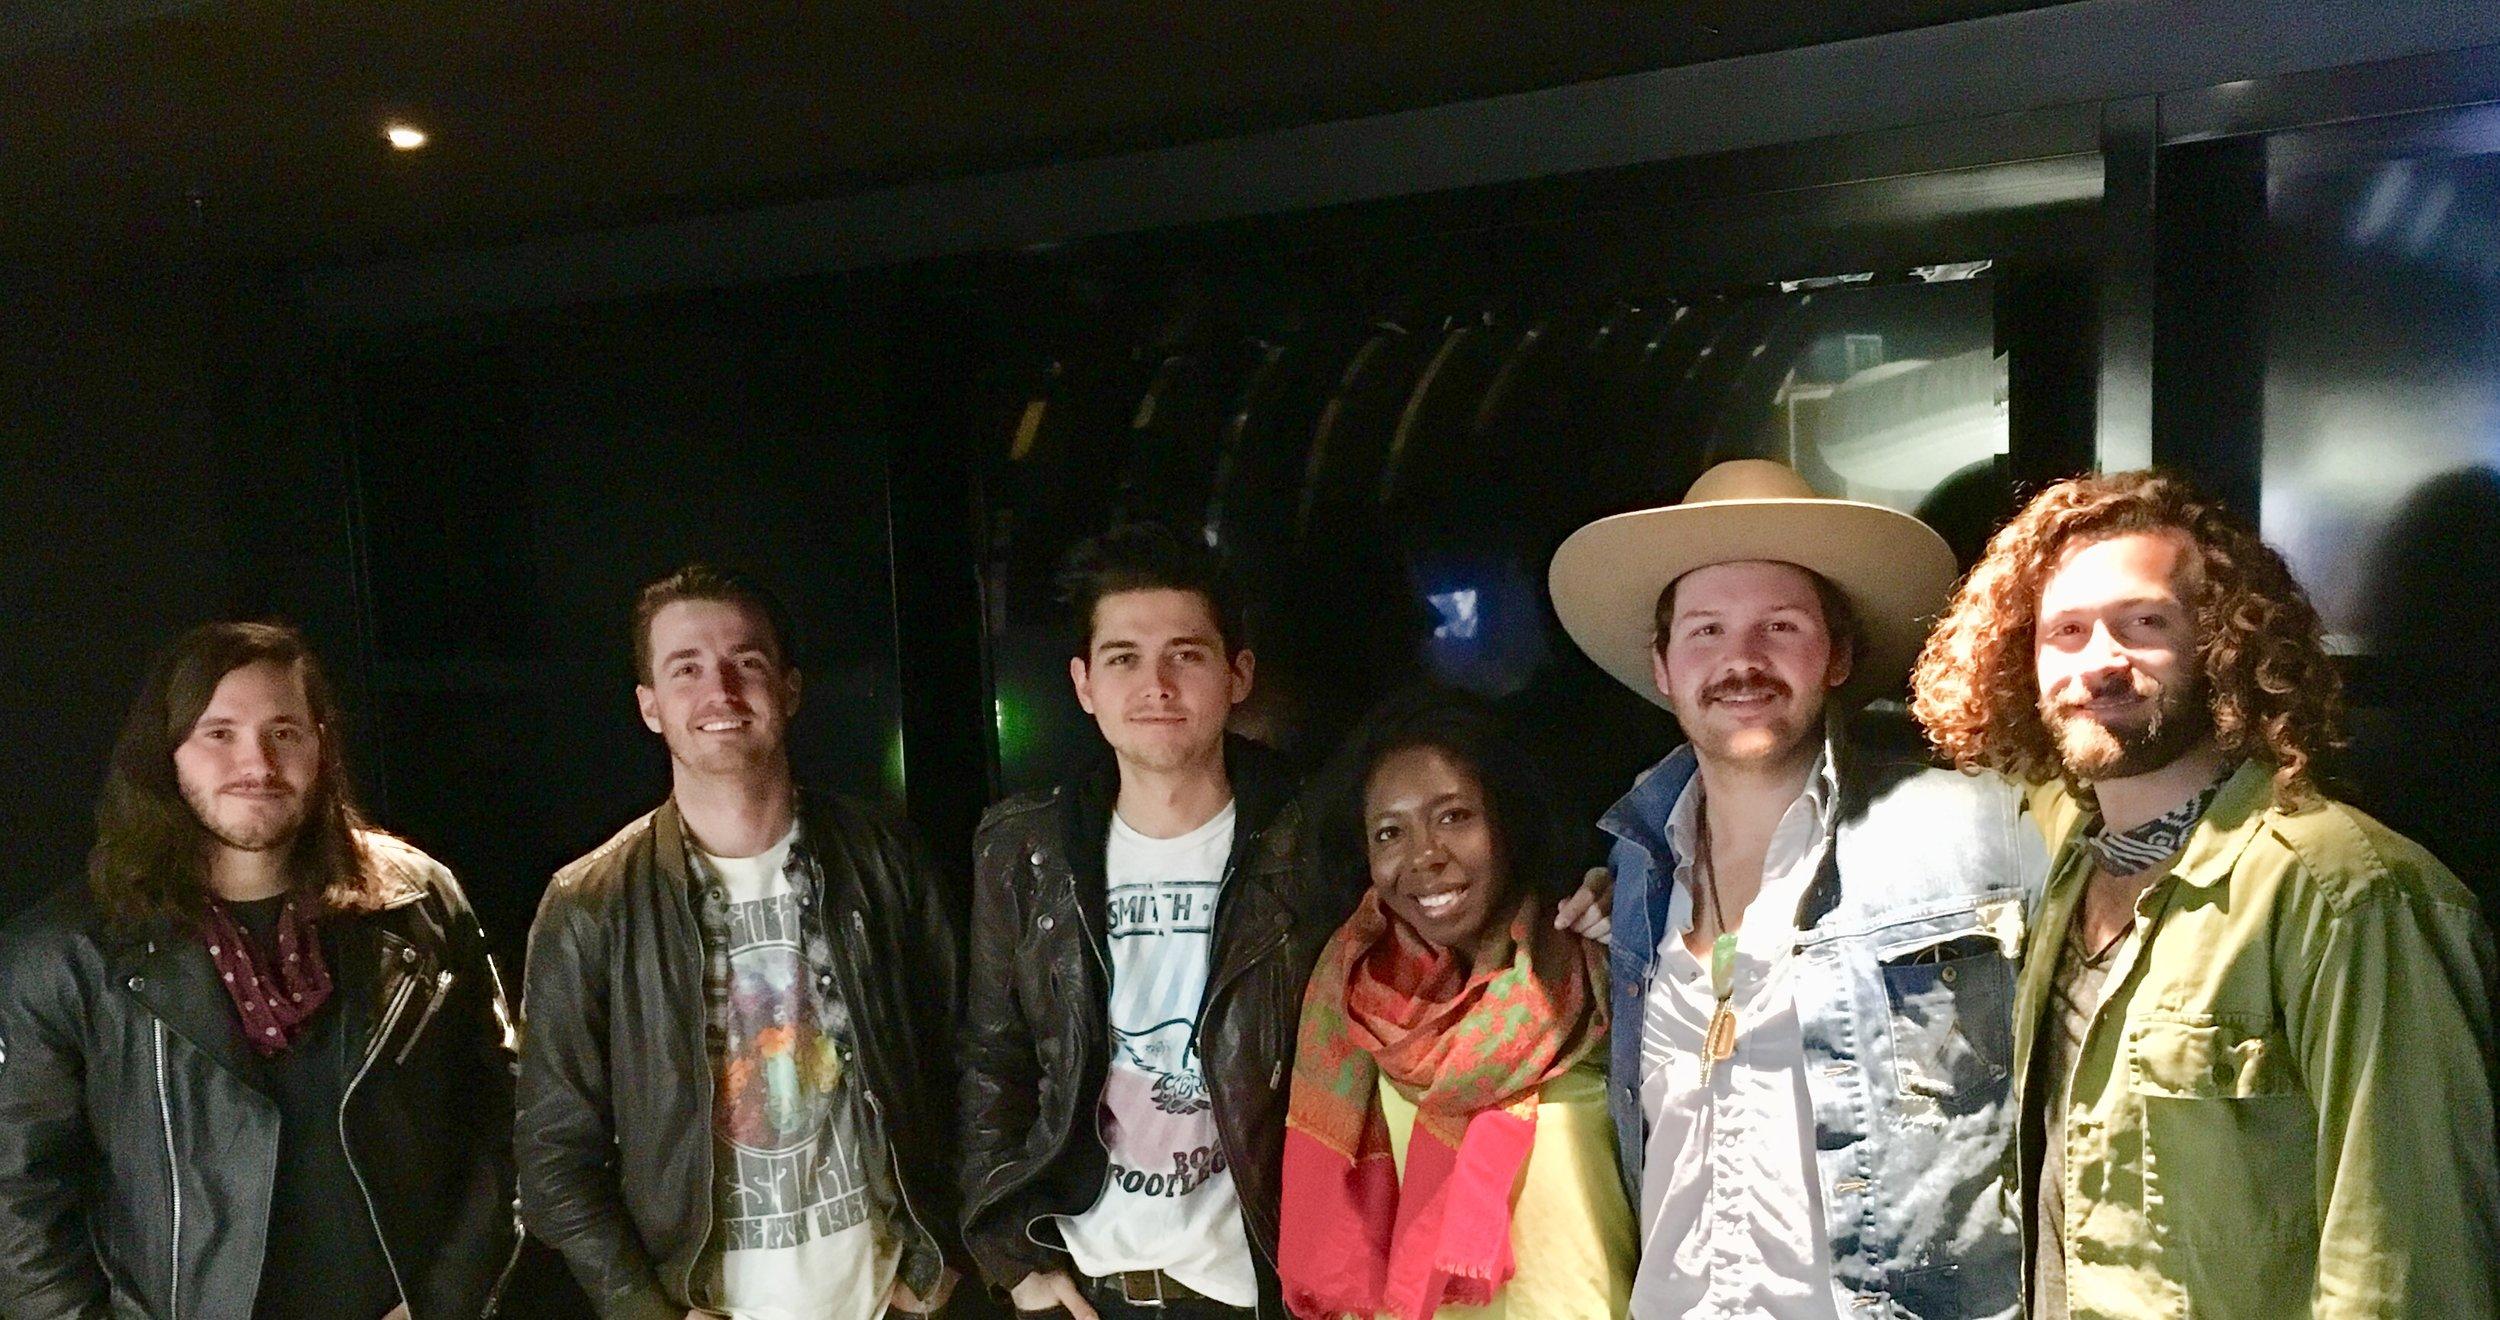 Country Music Band, LANCO